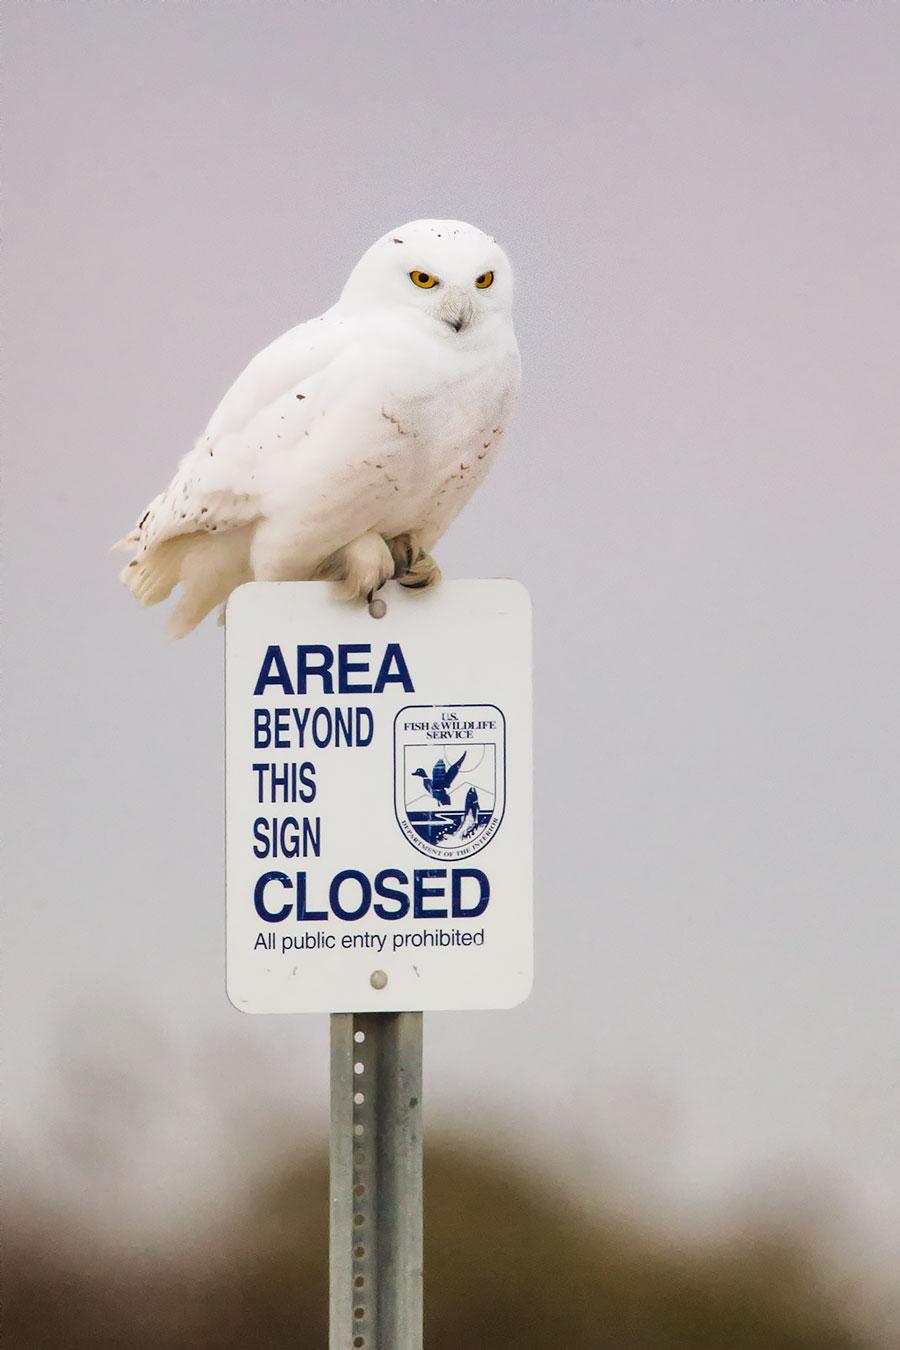 Mr. Handbersome, The Snow Owl